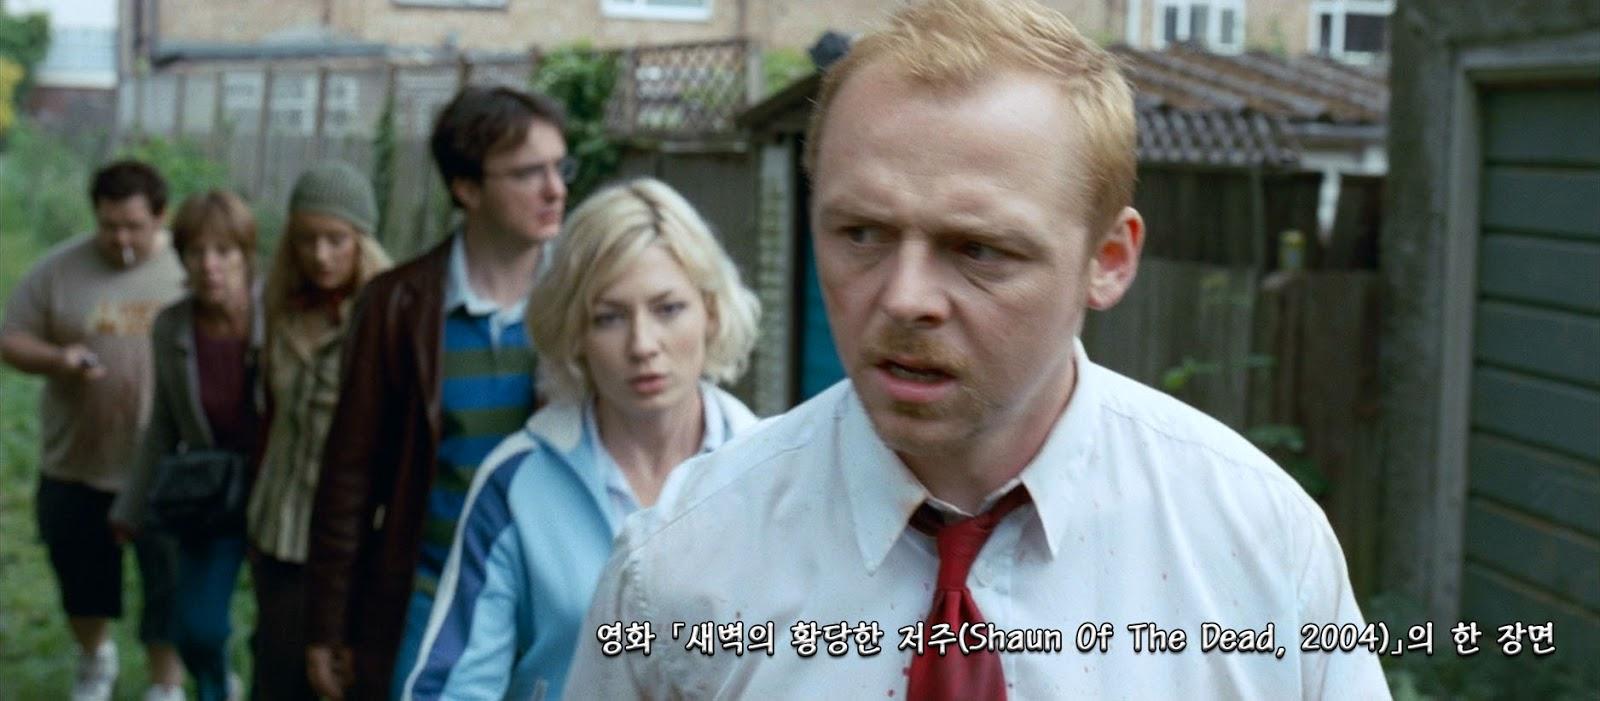 Shaun Of The Dead 2004 scene 02